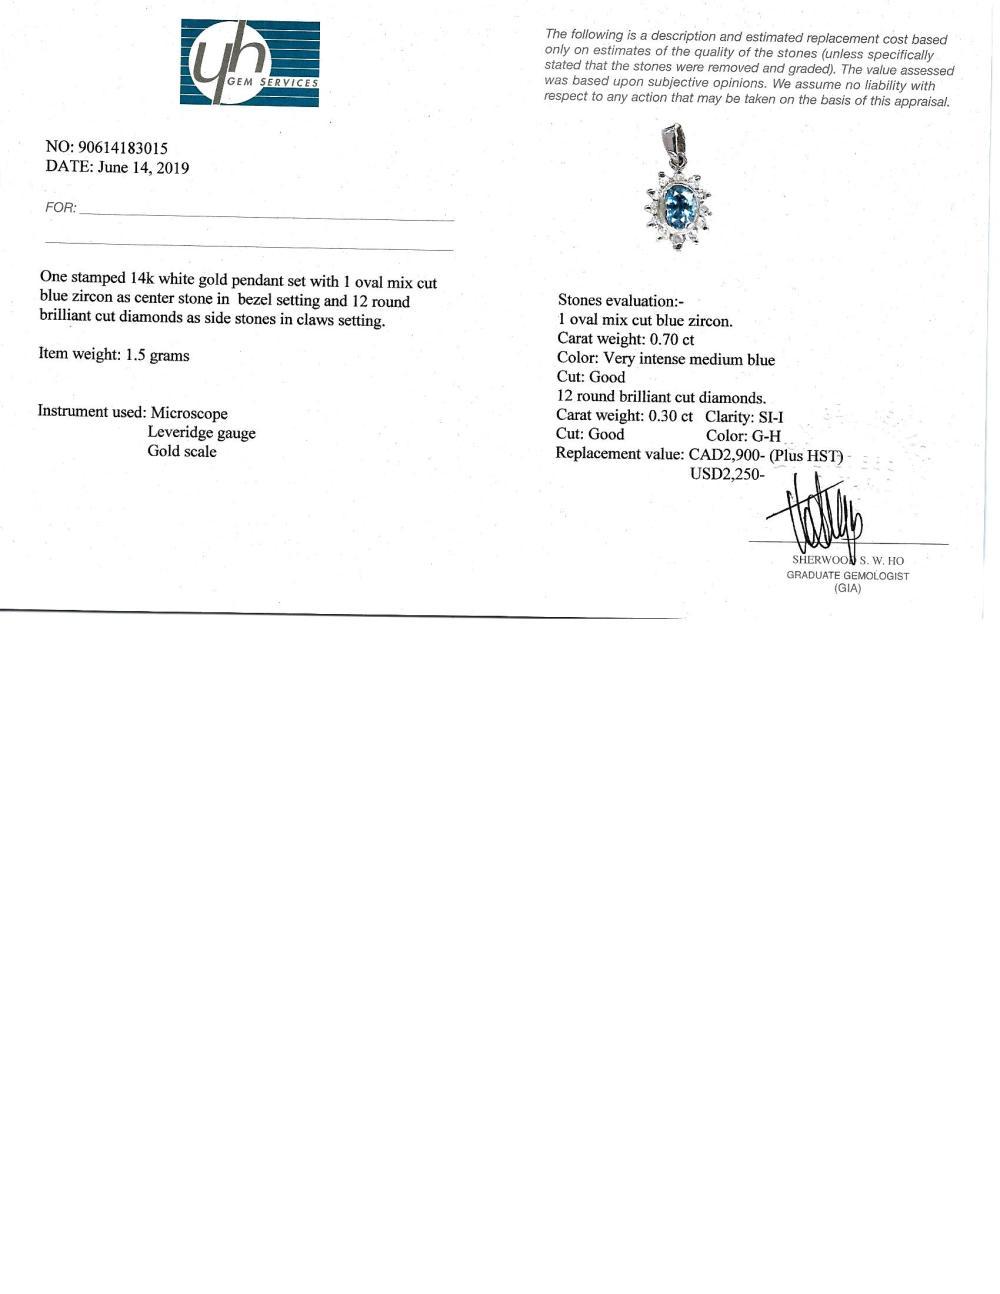 Certified 14K Blue Zircon(0.7ct) 12 Diamond(0.3ct) Pendant